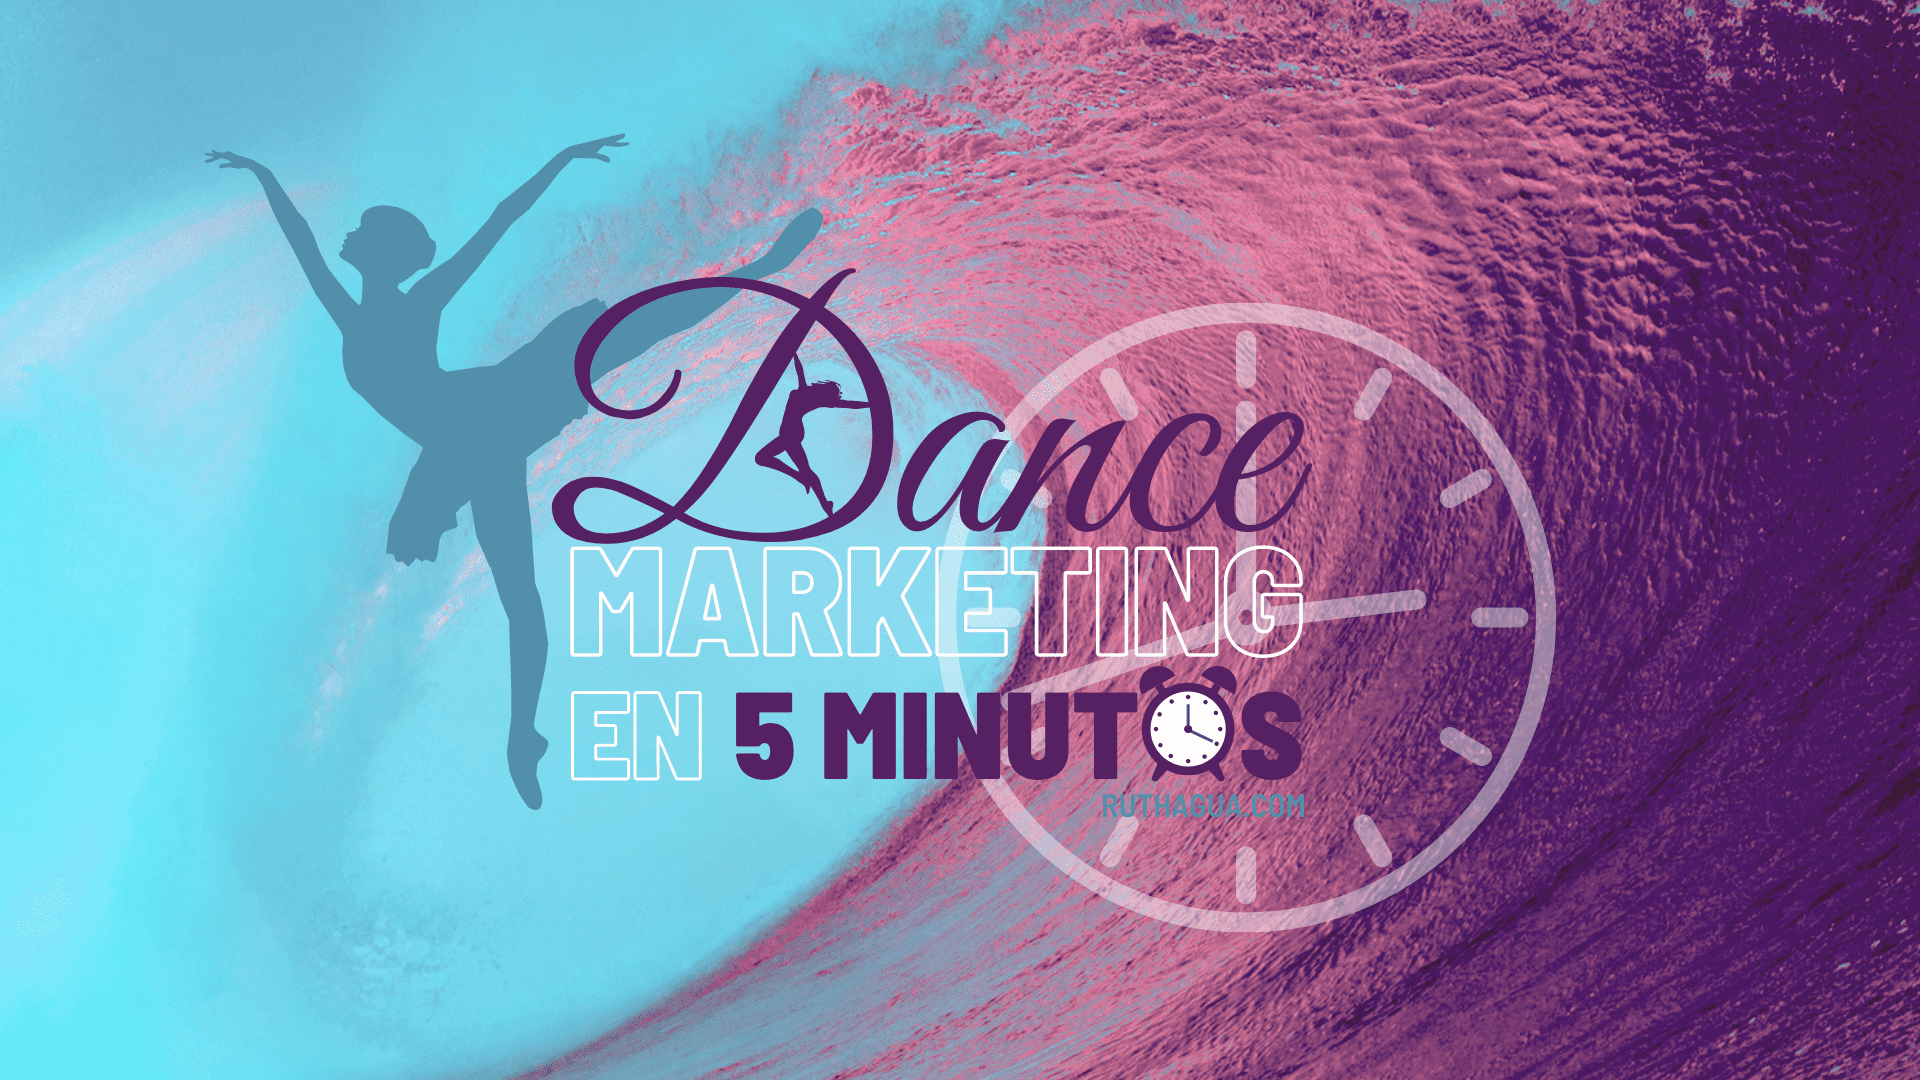 Dance Marketing en 5 minutos